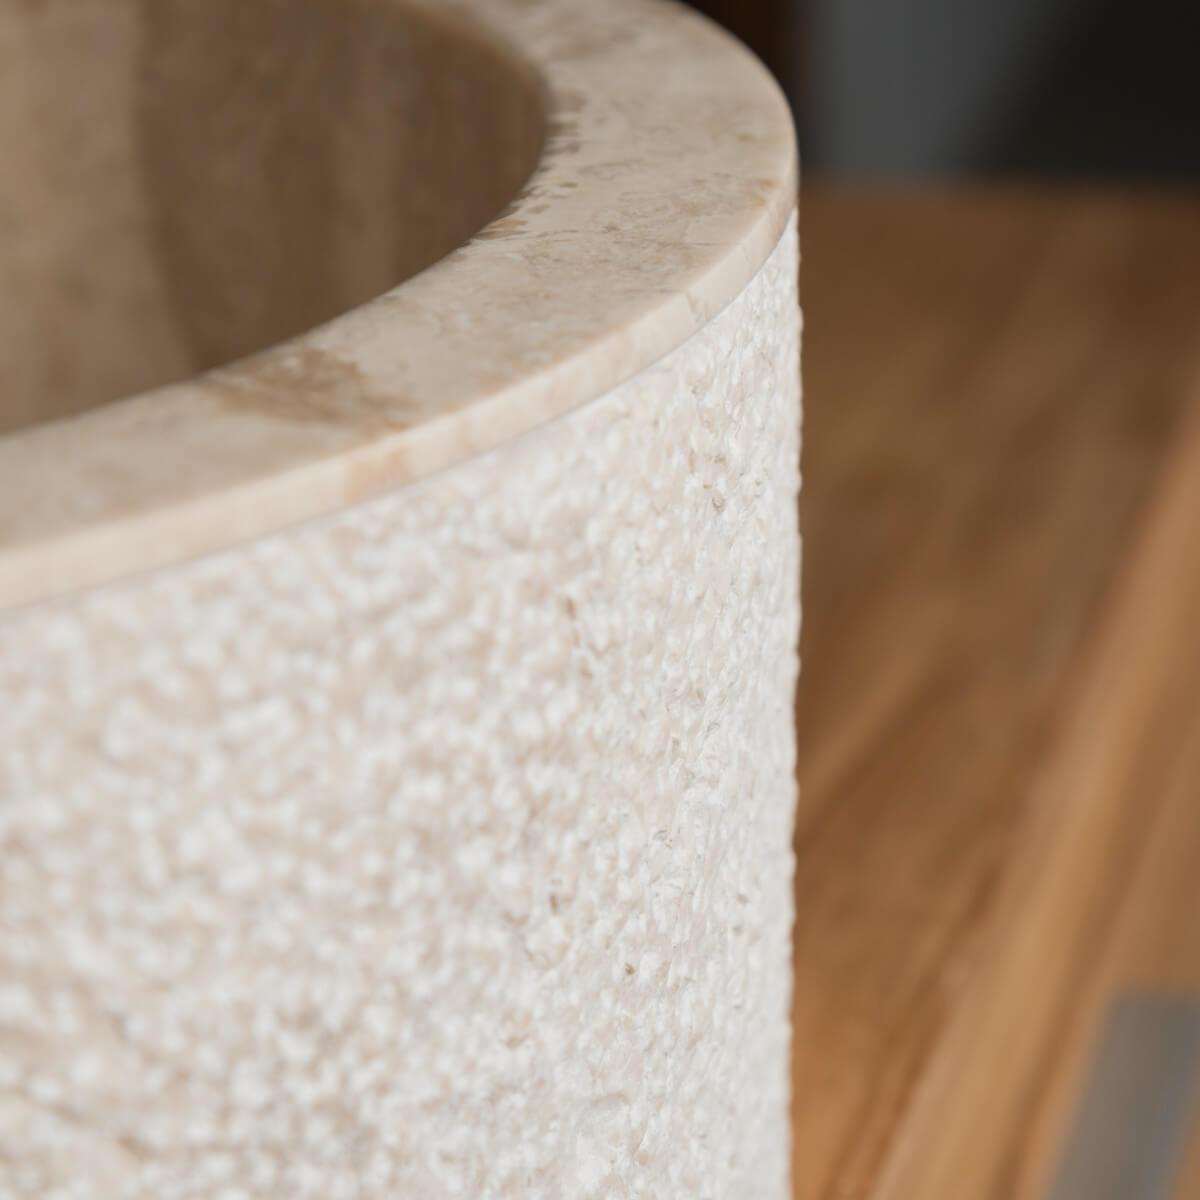 vasque poser marbre ronde cr me elbe l 40 x p 40 x h 15 cm. Black Bedroom Furniture Sets. Home Design Ideas